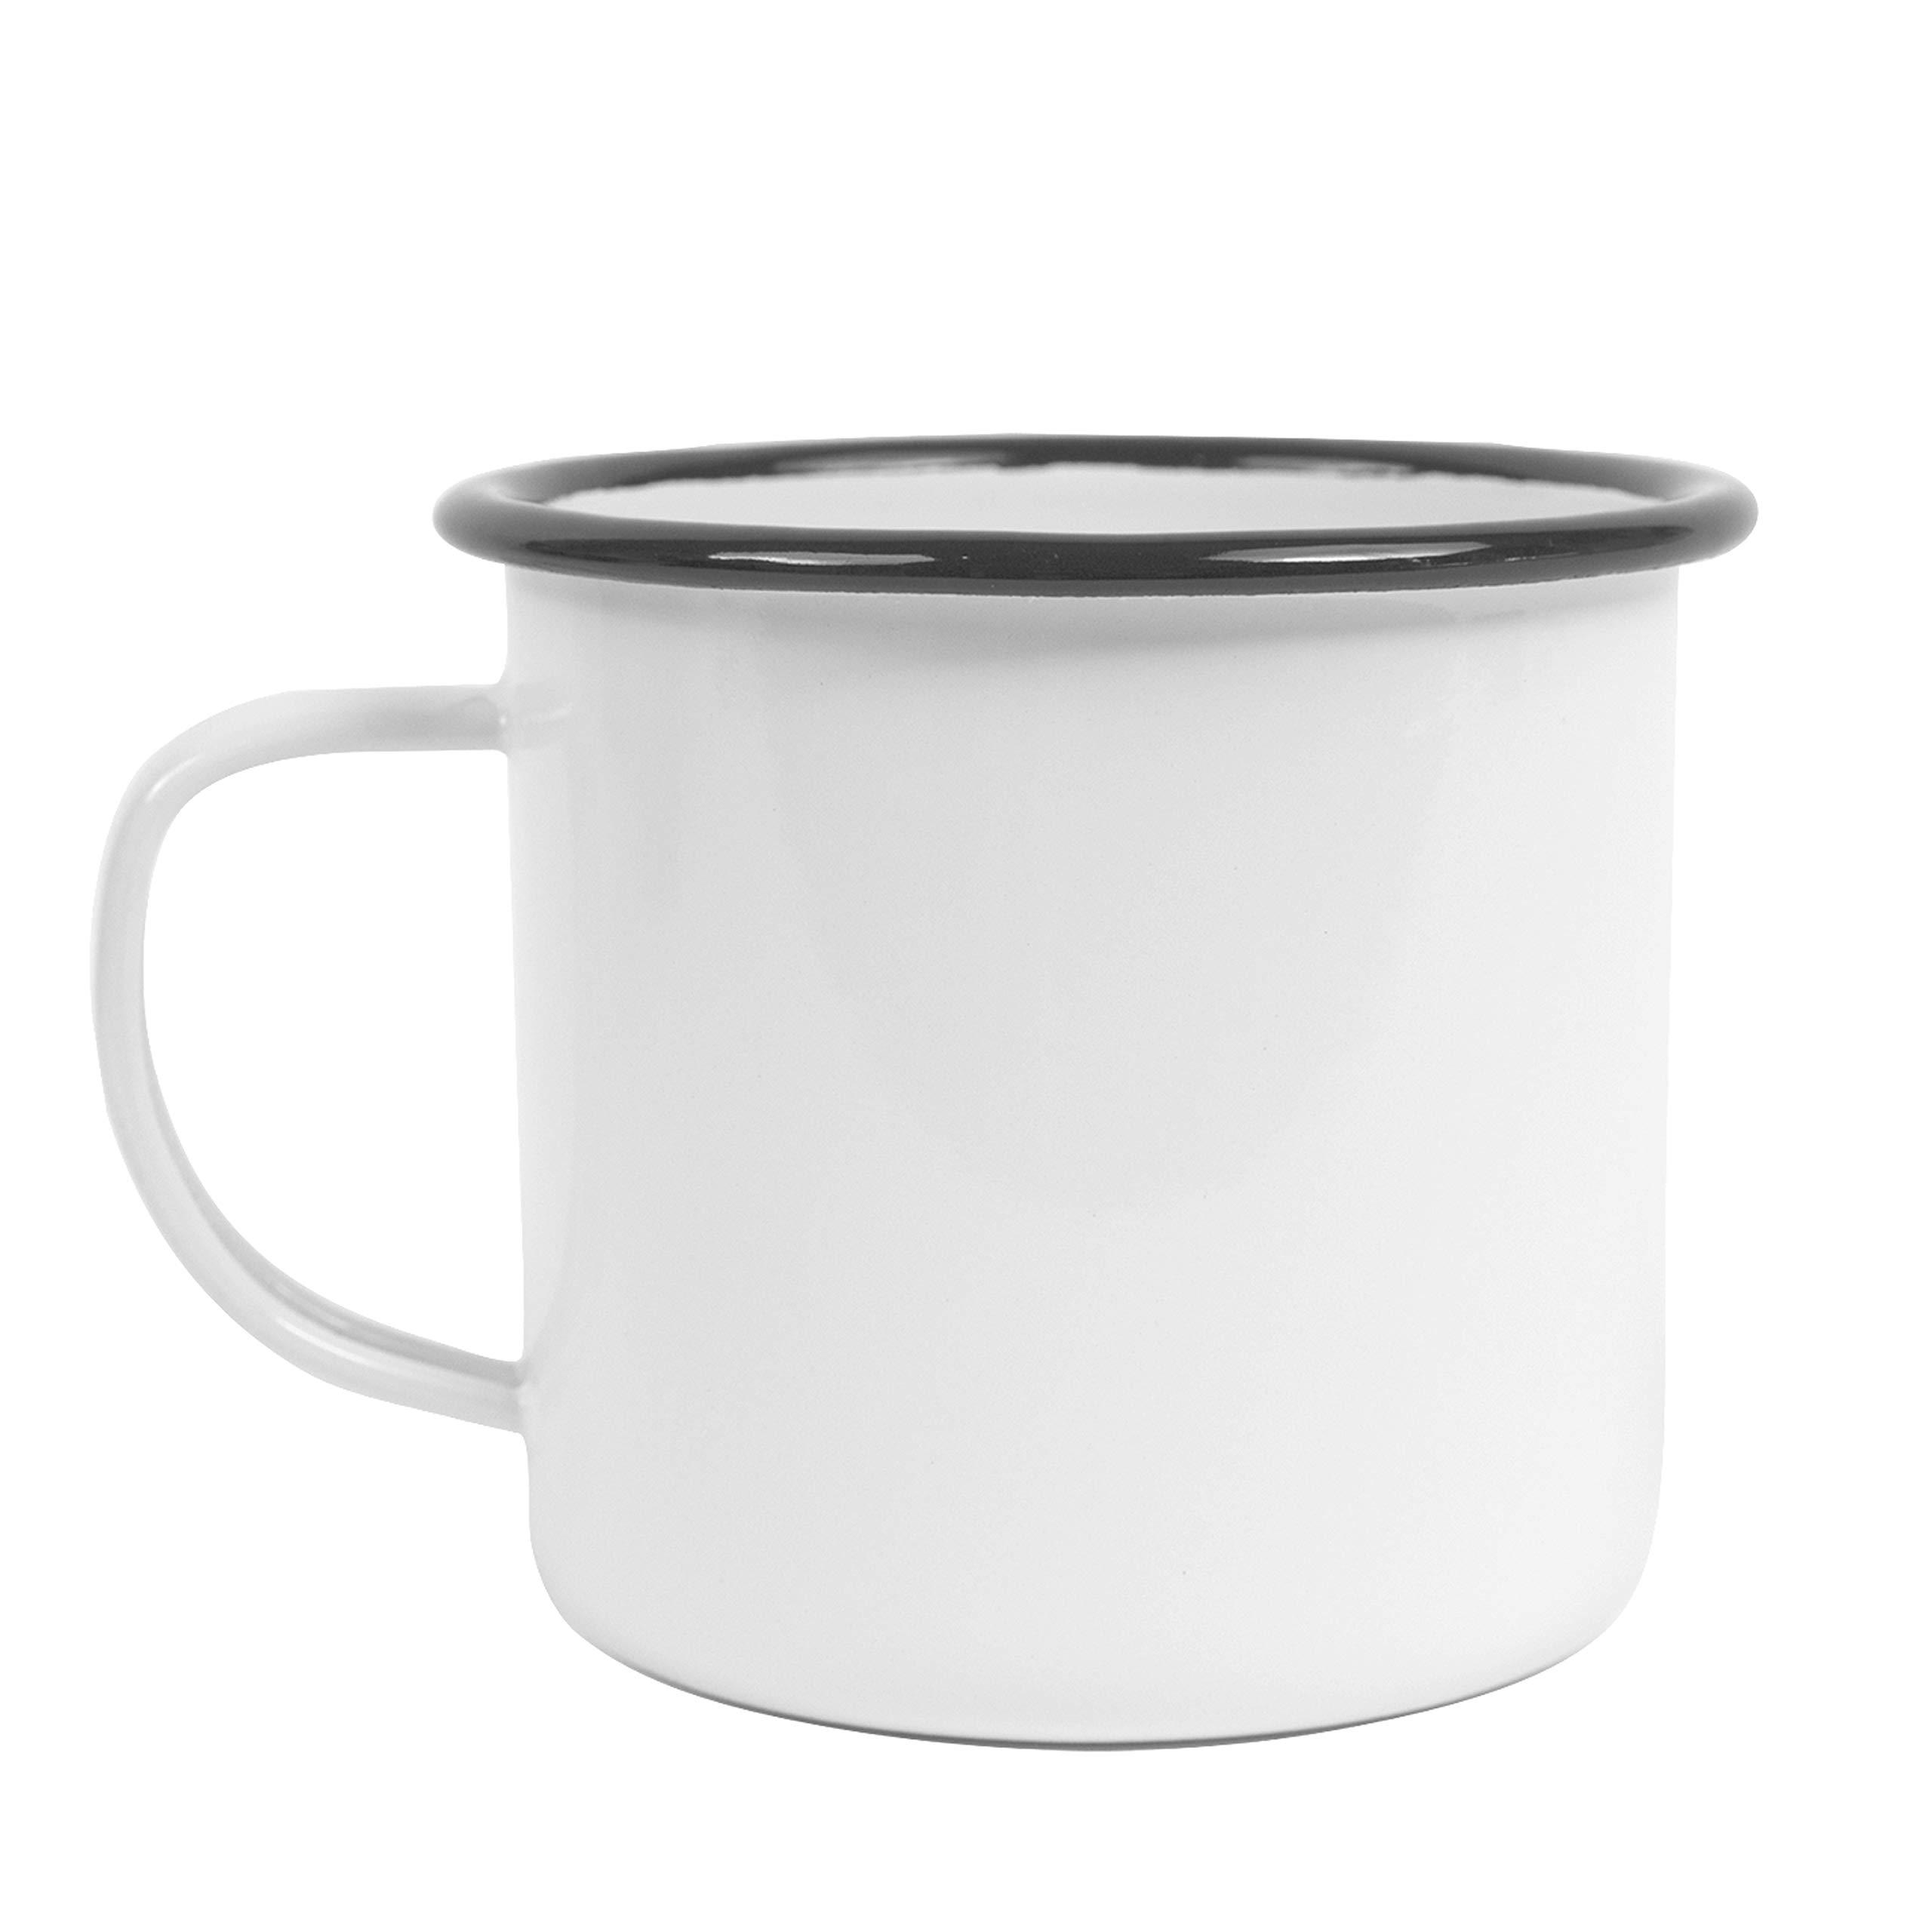 Enamelware Mug, 16 ounce, Vintage White/Black (Set of 4)